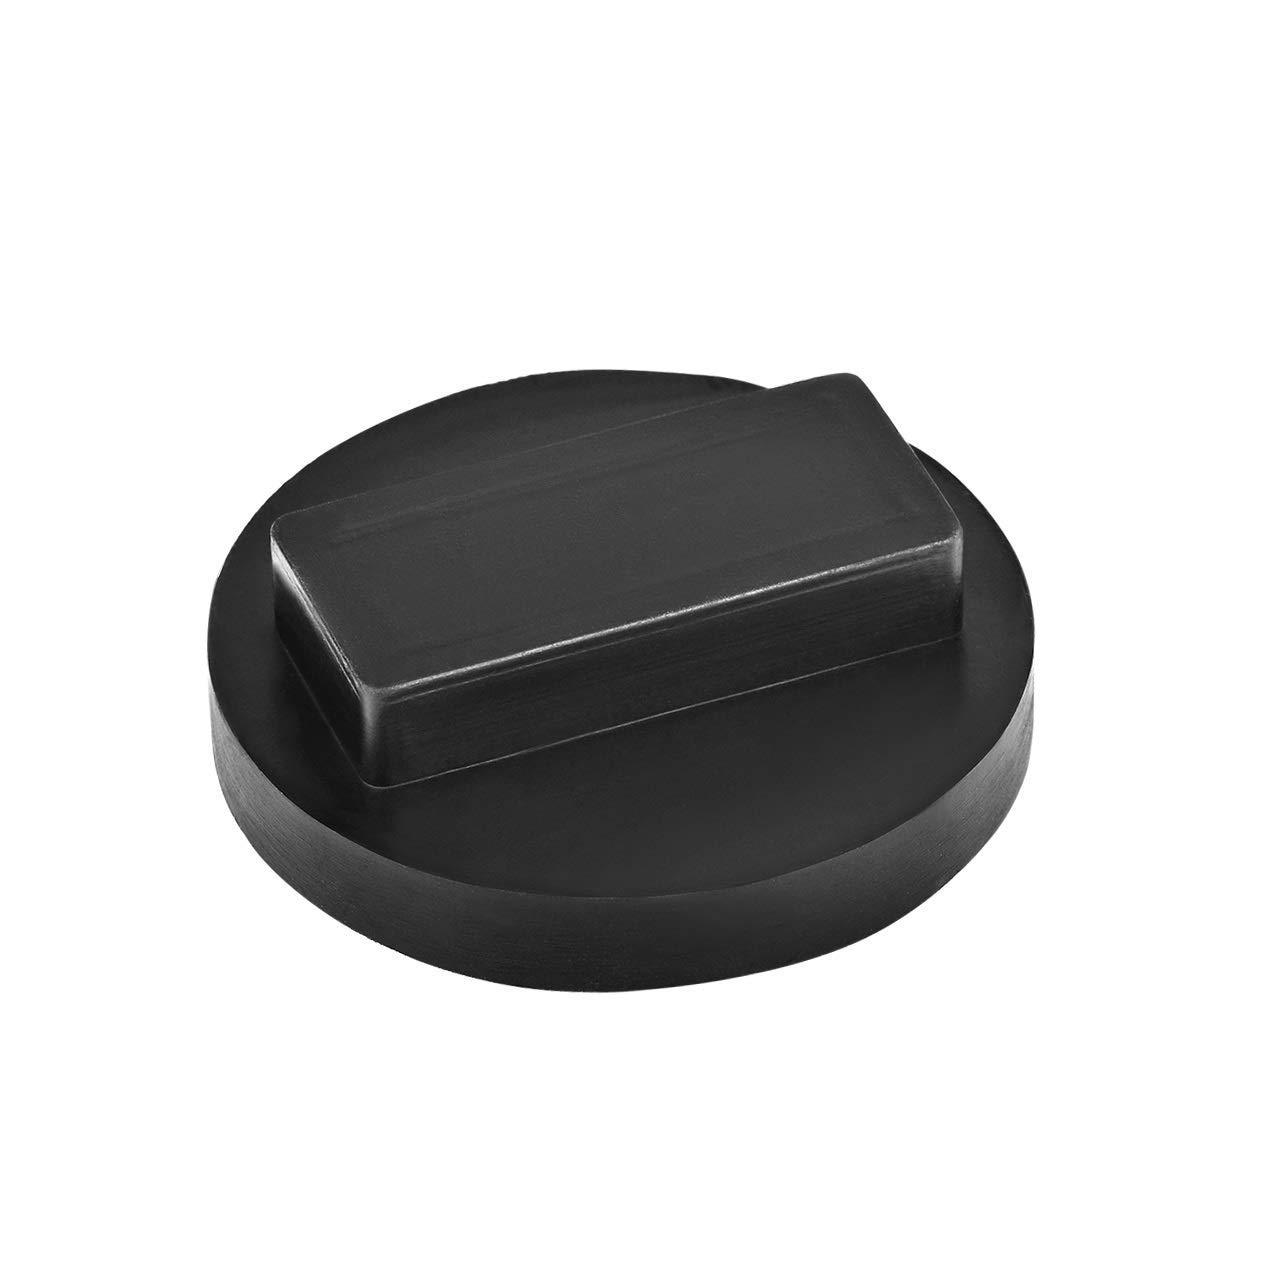 DEDC 2 Pack Jack Pad for BMW /& Mini Jack Pad Square Polyurethane Jack Pad Adapter Frame Rail Protector